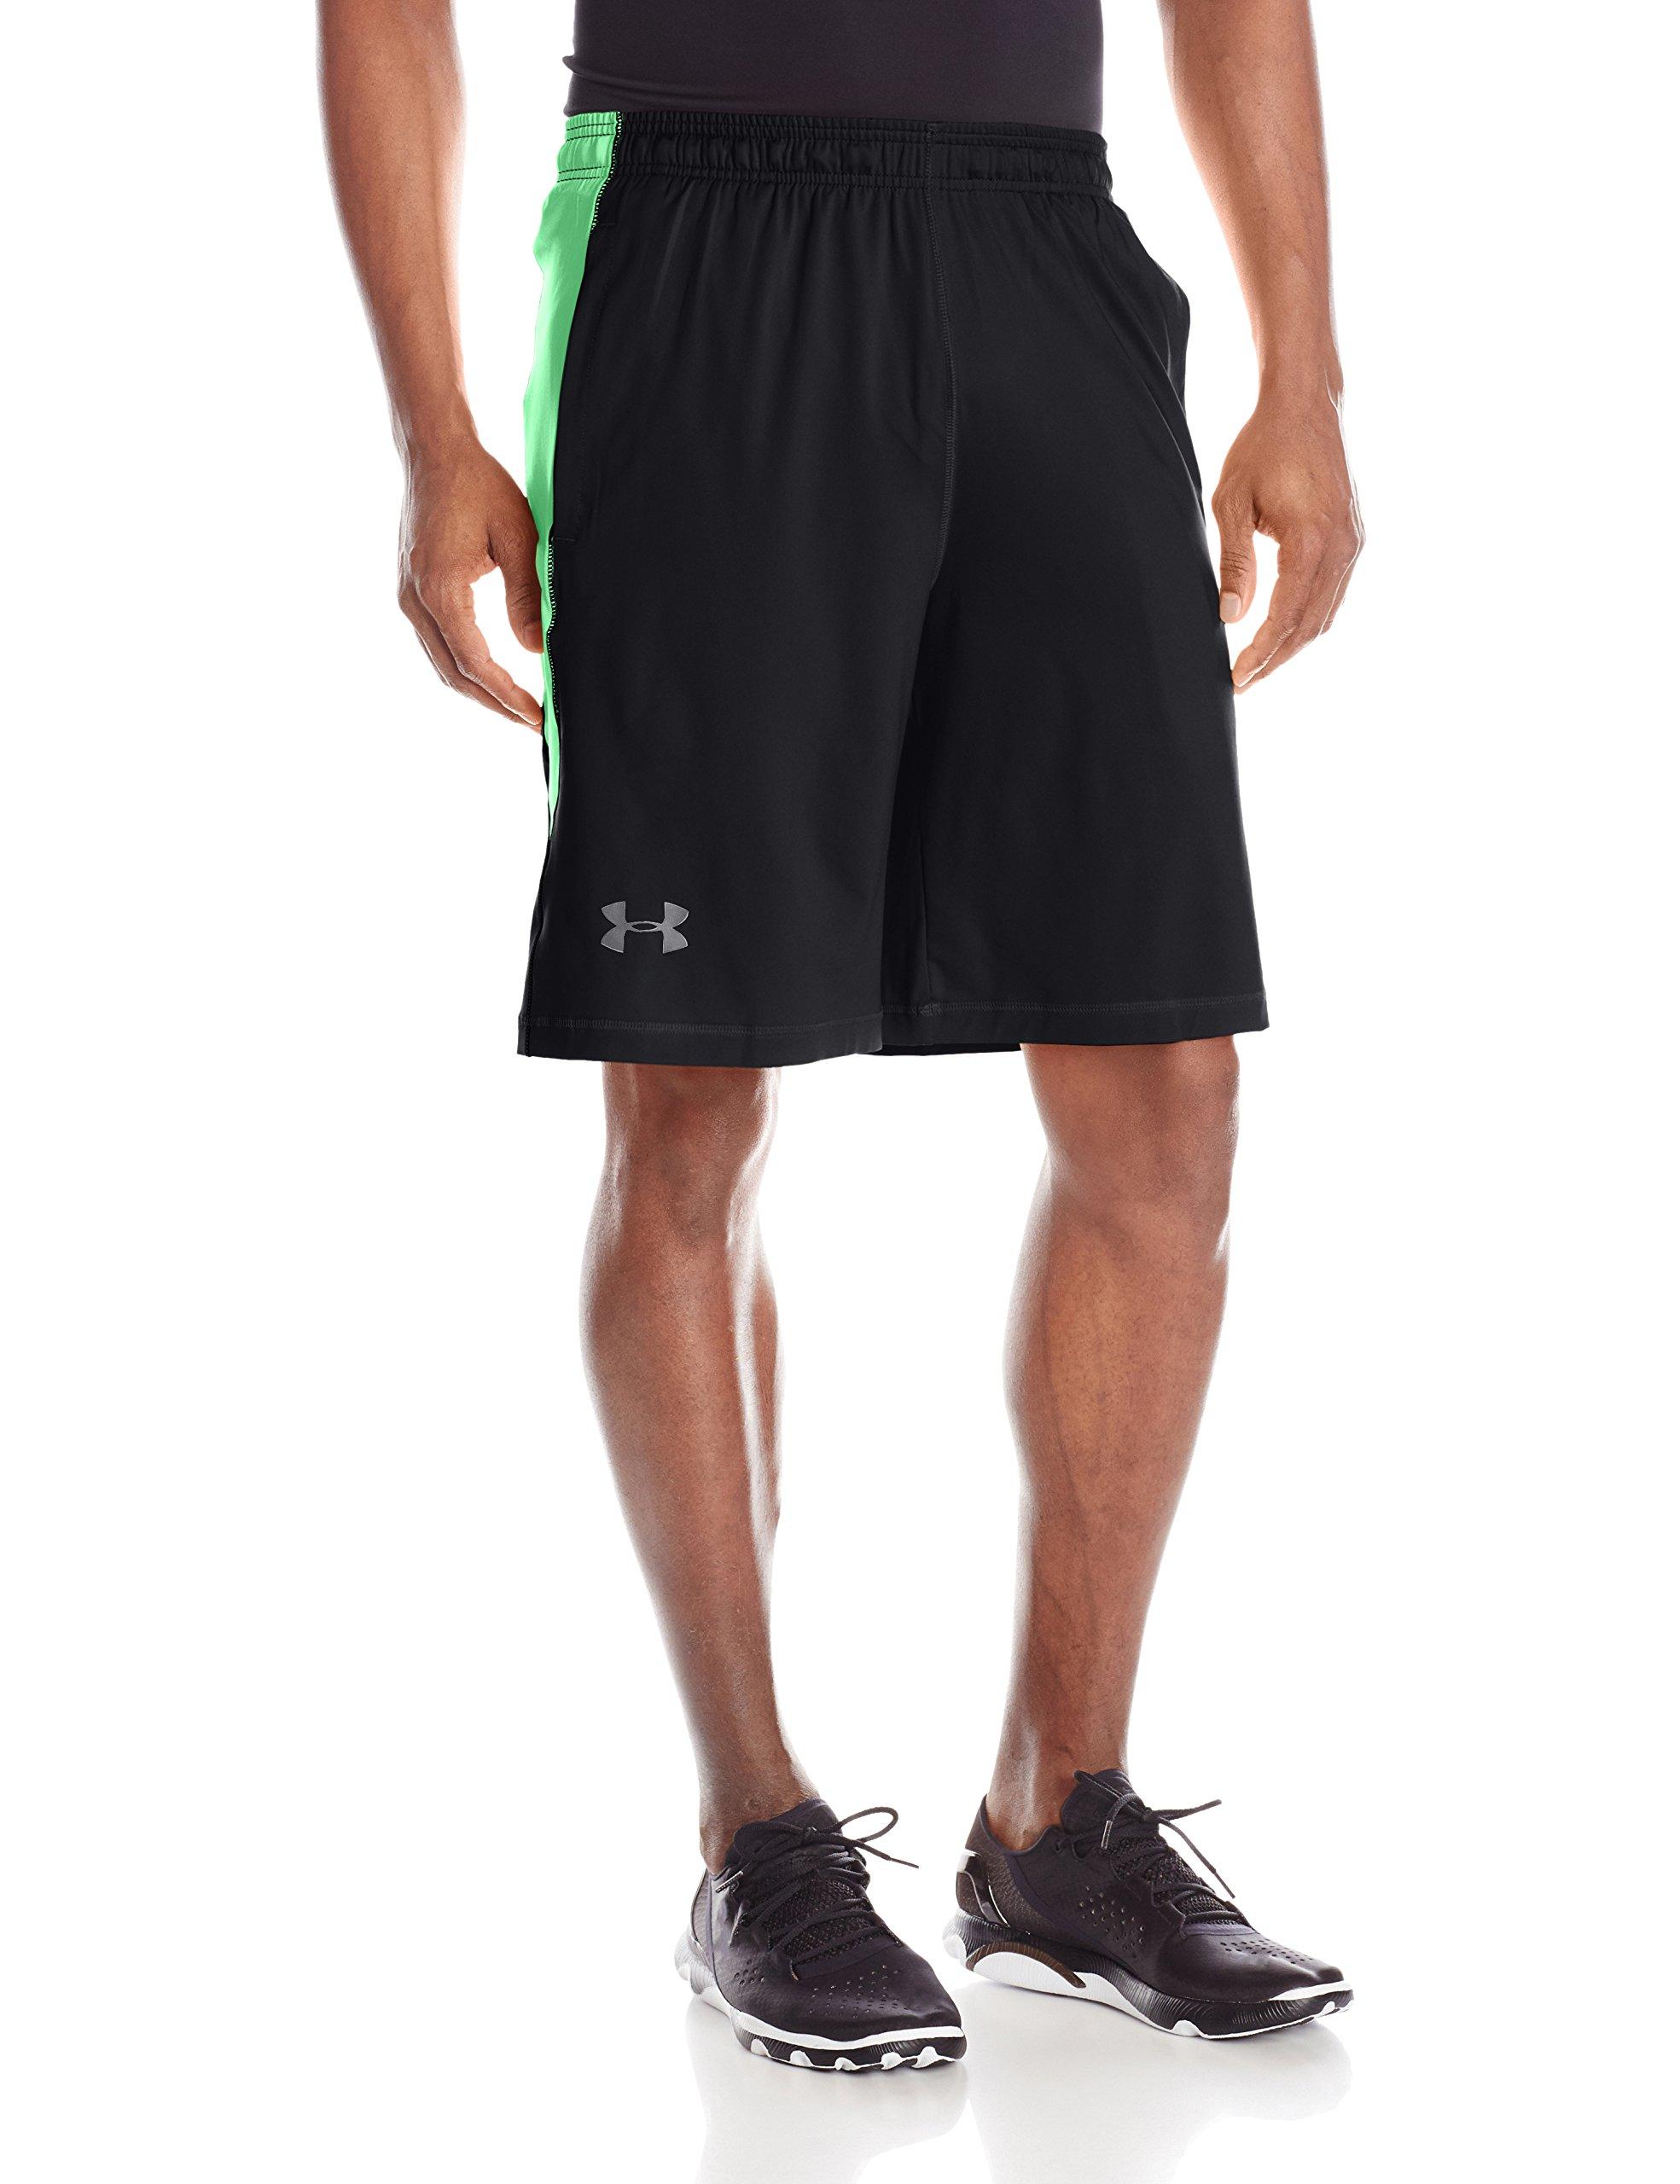 Under Armour Men's Raid 10'' Shorts, Black /Arena Green, Small